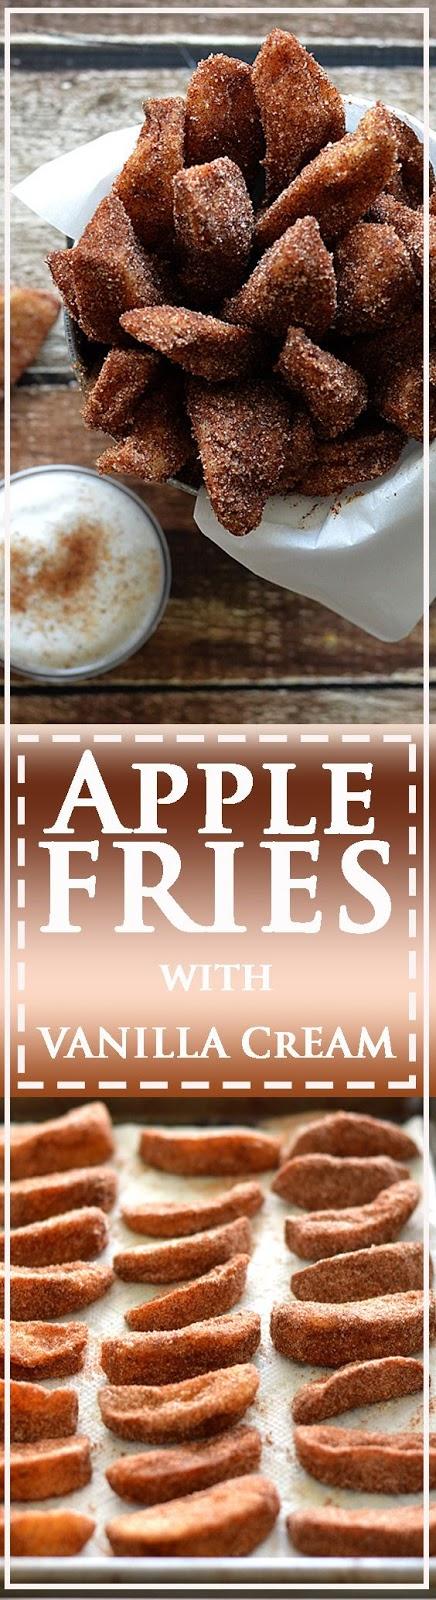 Apple Fries with Vanilla Whipped Cream (Vegan)